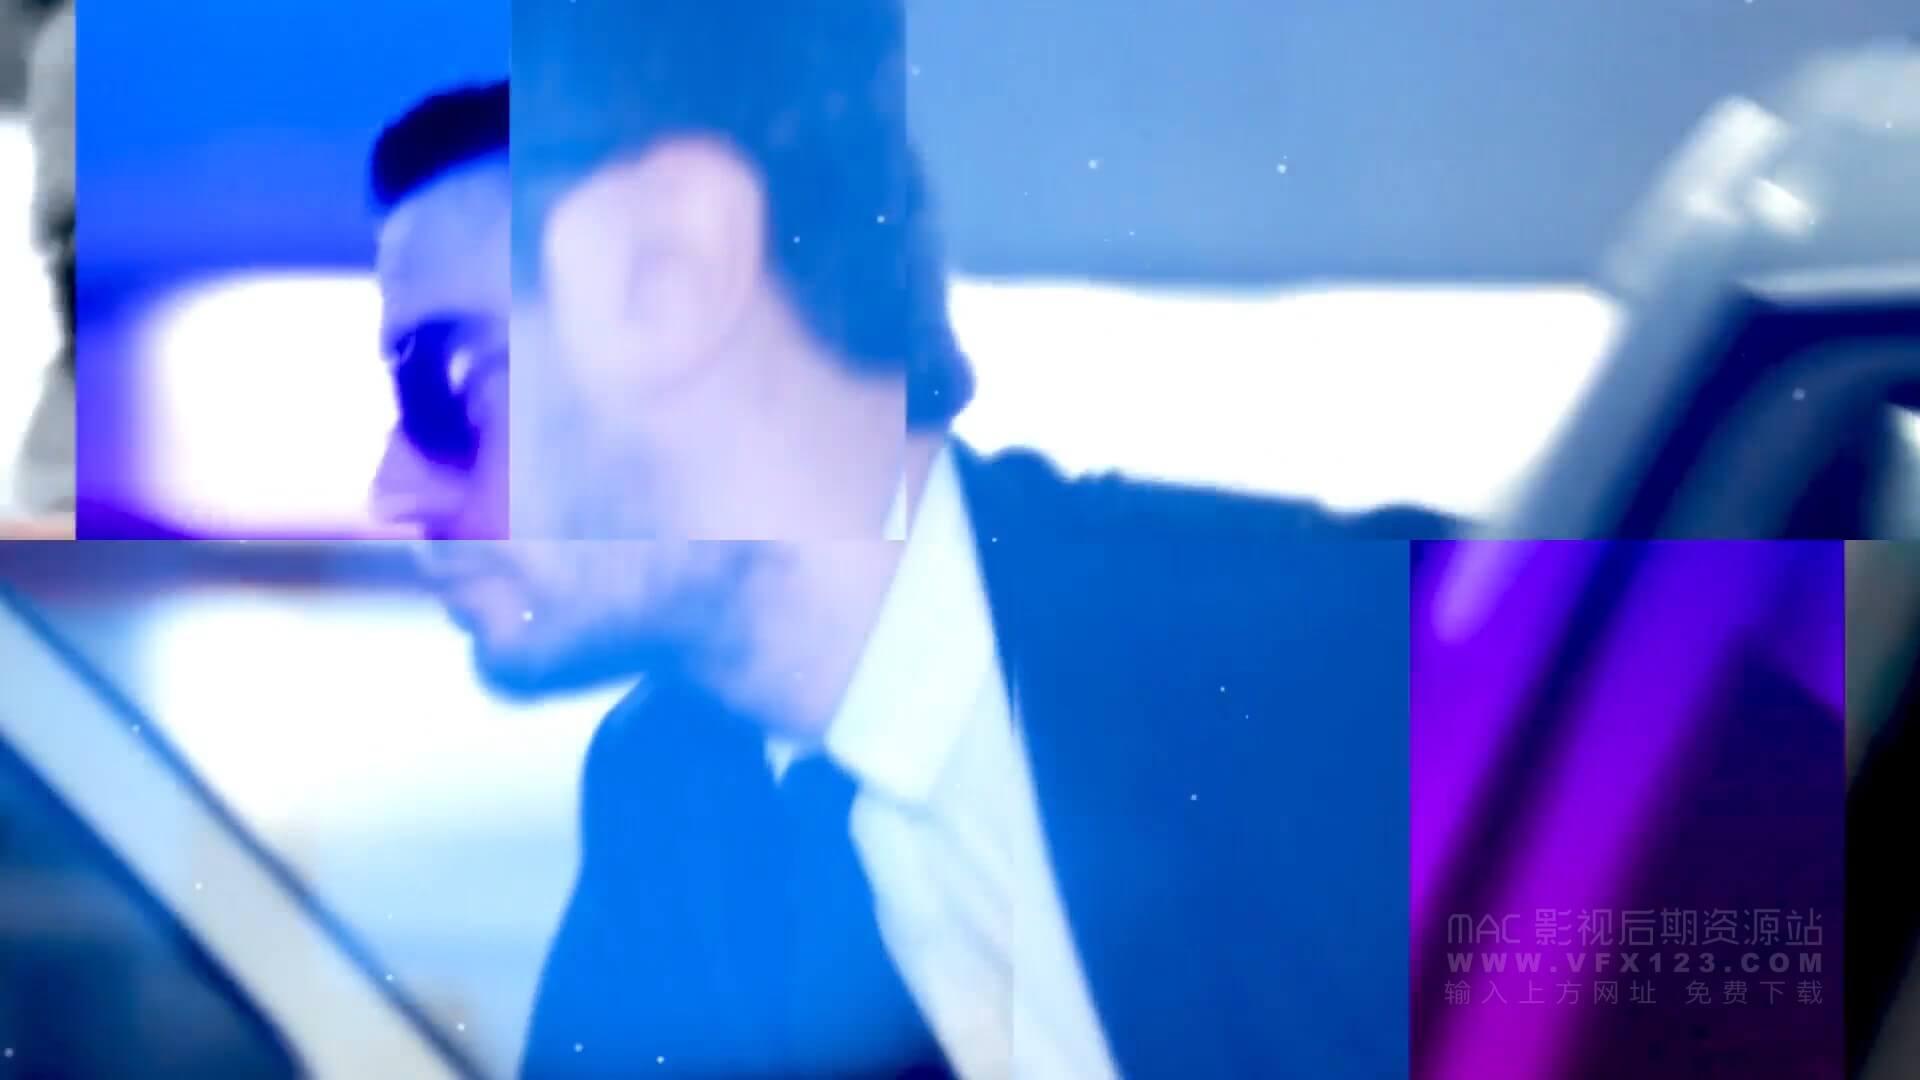 AE模板 500+转场集合包 含镜头图形闪光干扰网格水墨线条光晕运动效果+音效素材 丨 MAC影视后期资源站